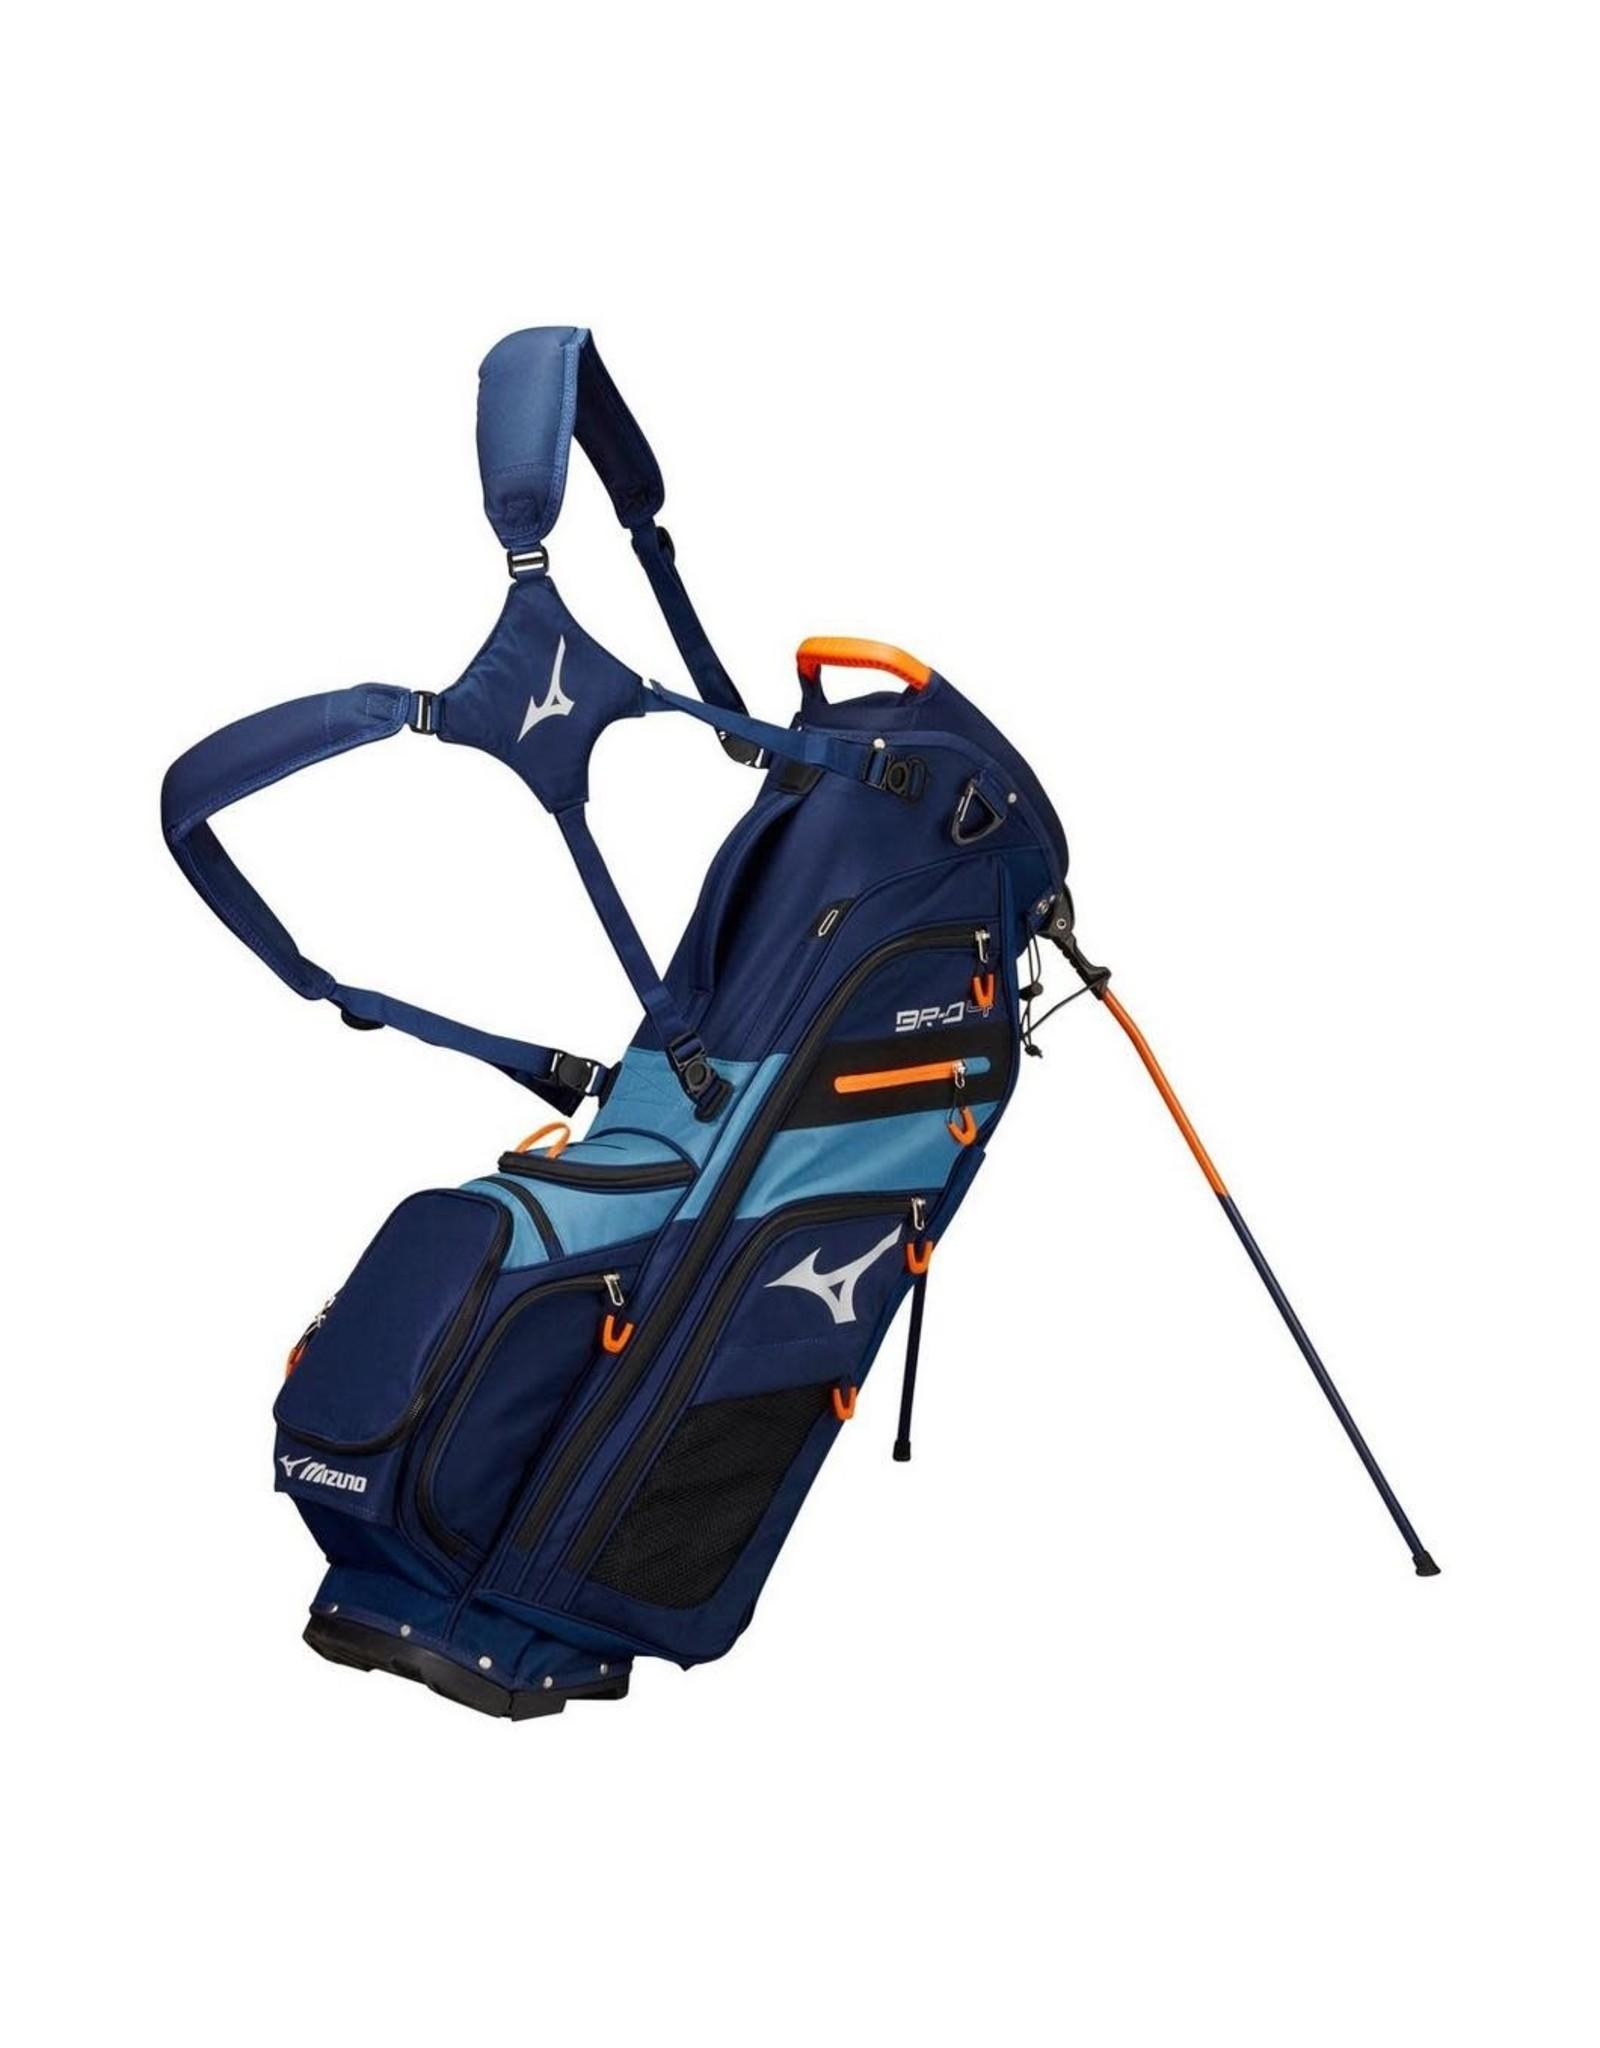 Mizuno Mizuno BR-D4 14-Way Stand Bags